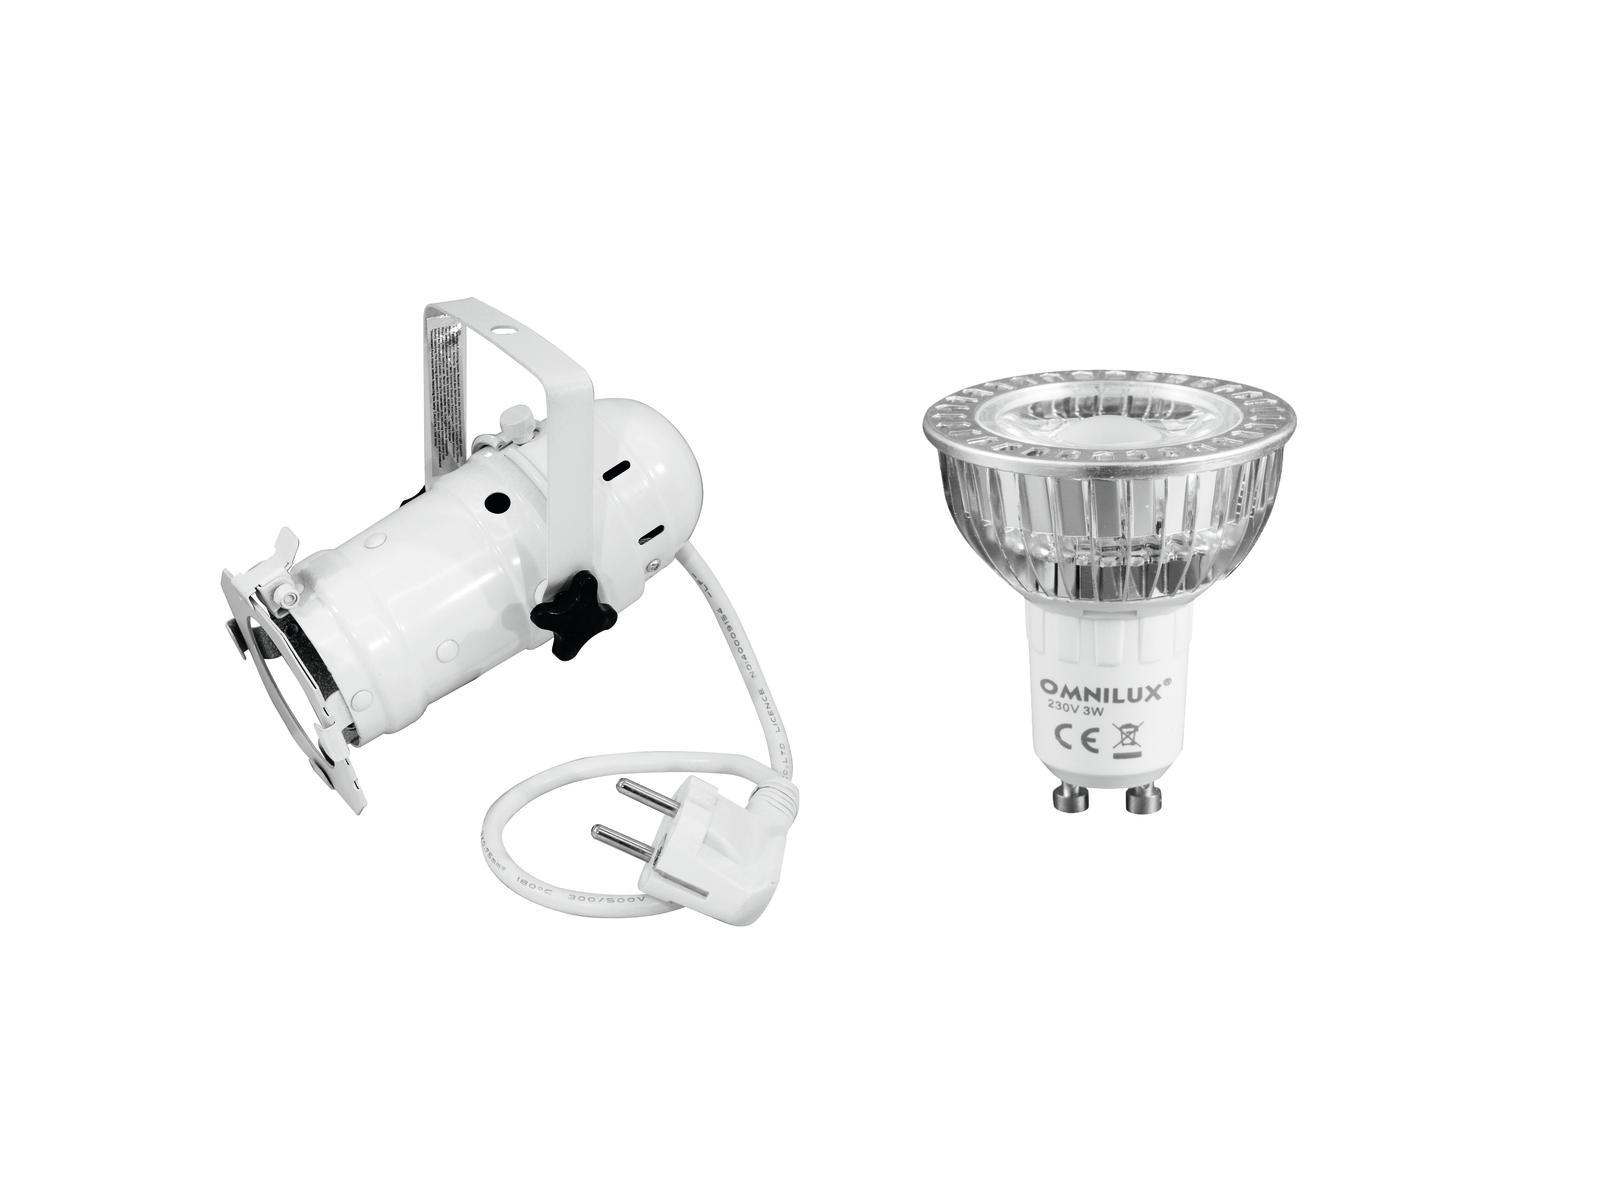 EUROLITE Impostare PAR-16 Spot wh + GU-10 230V COB 1x3W LED 6000K